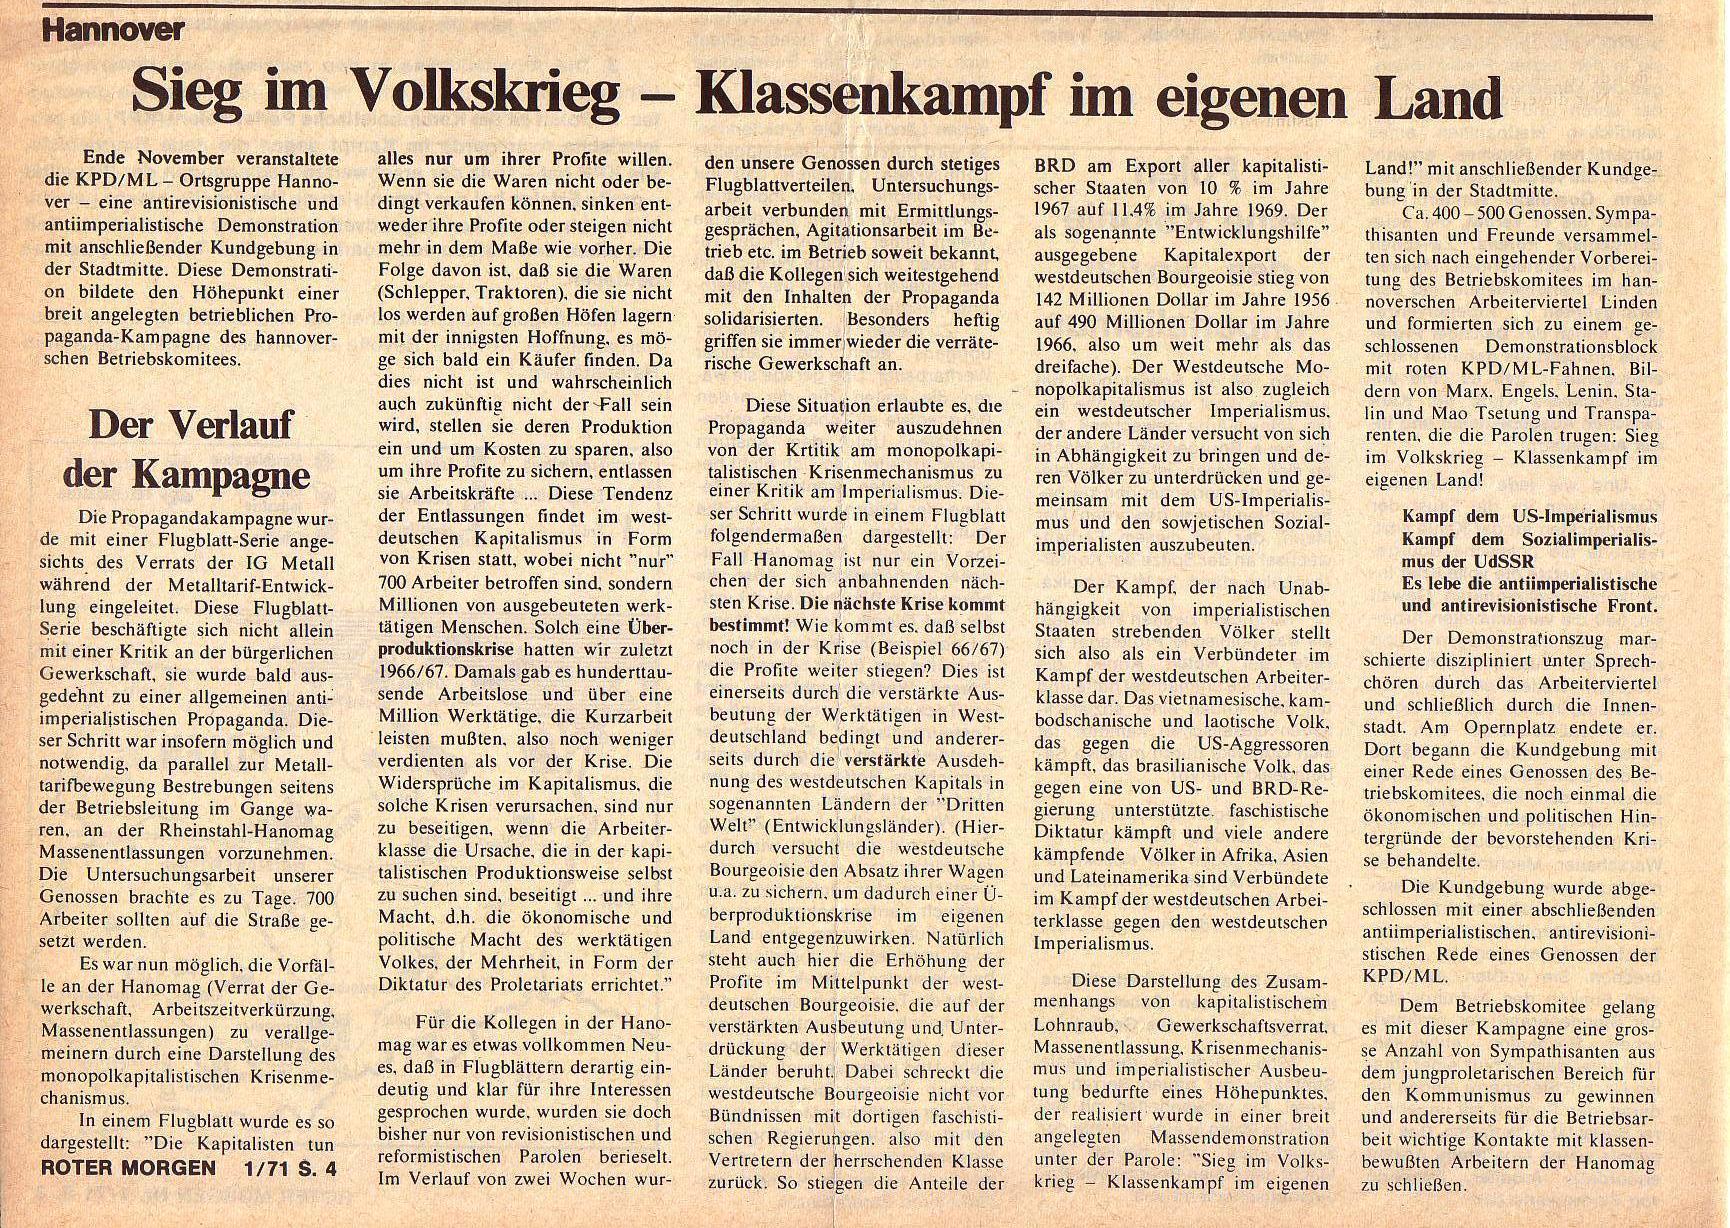 Roter Morgen, 5. Jg., Januar 1971, Nr. 1, Seite 4b